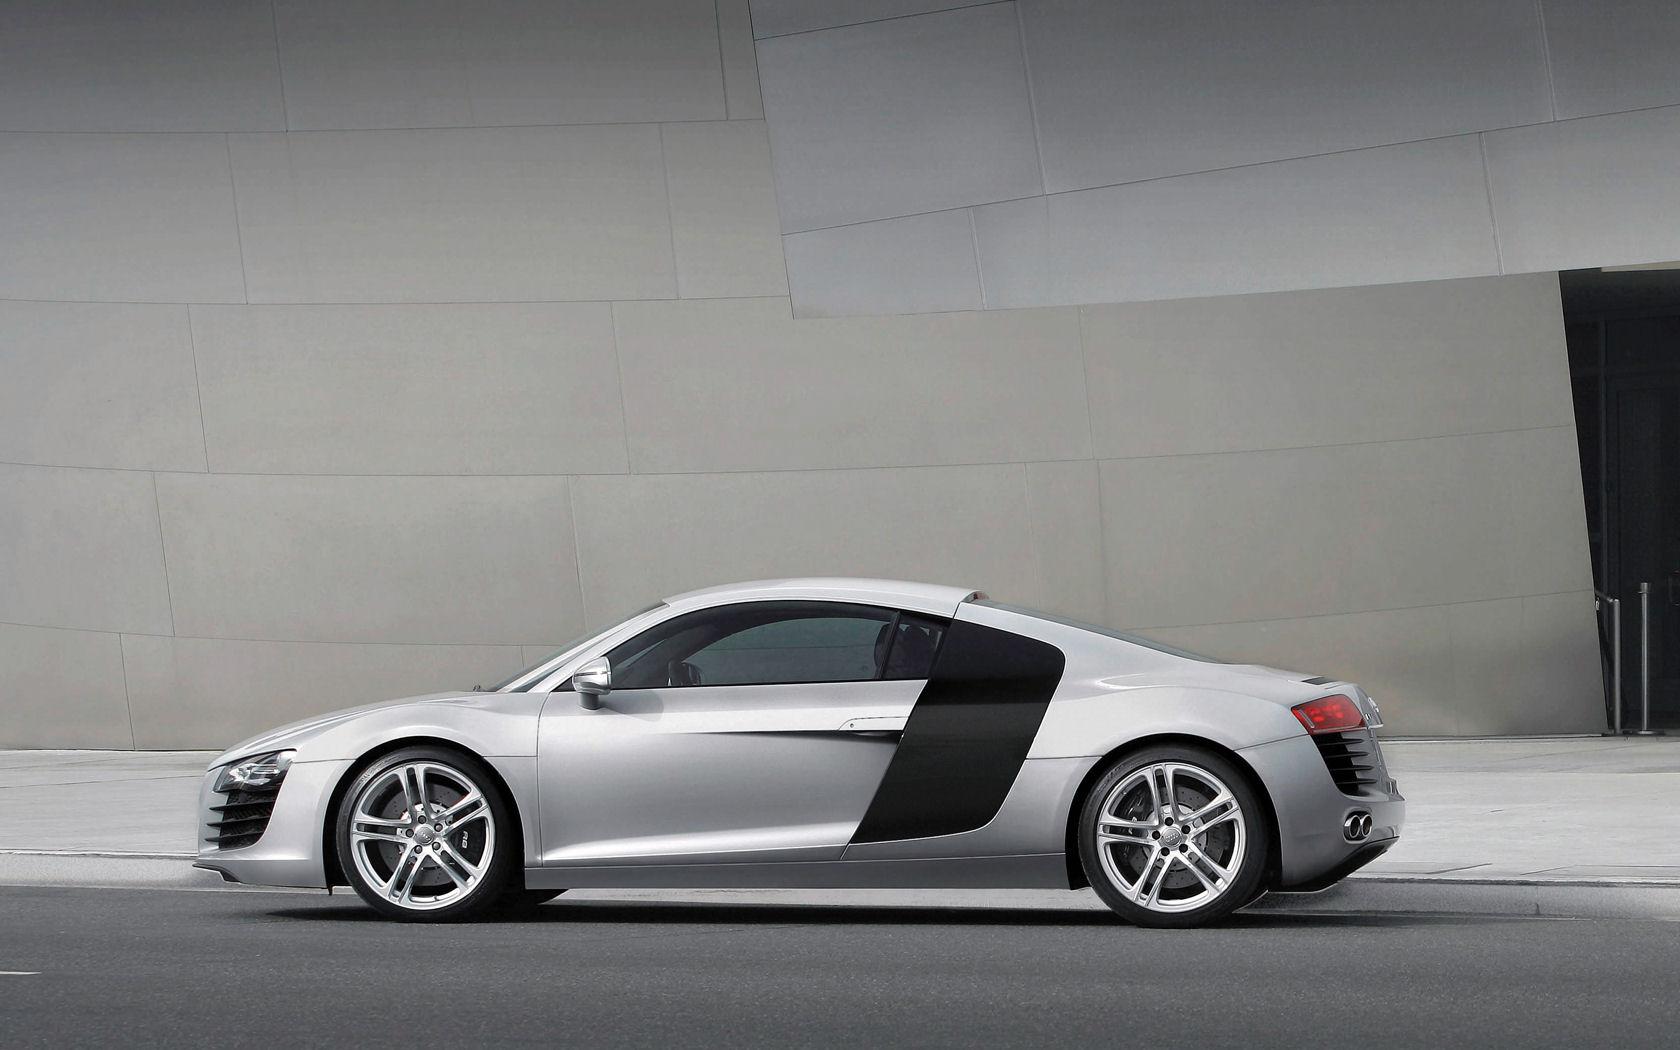 Free Download Audi Audi R8 Audi R8 Desktop Wallpapers Widescreen Images, Photos, Reviews